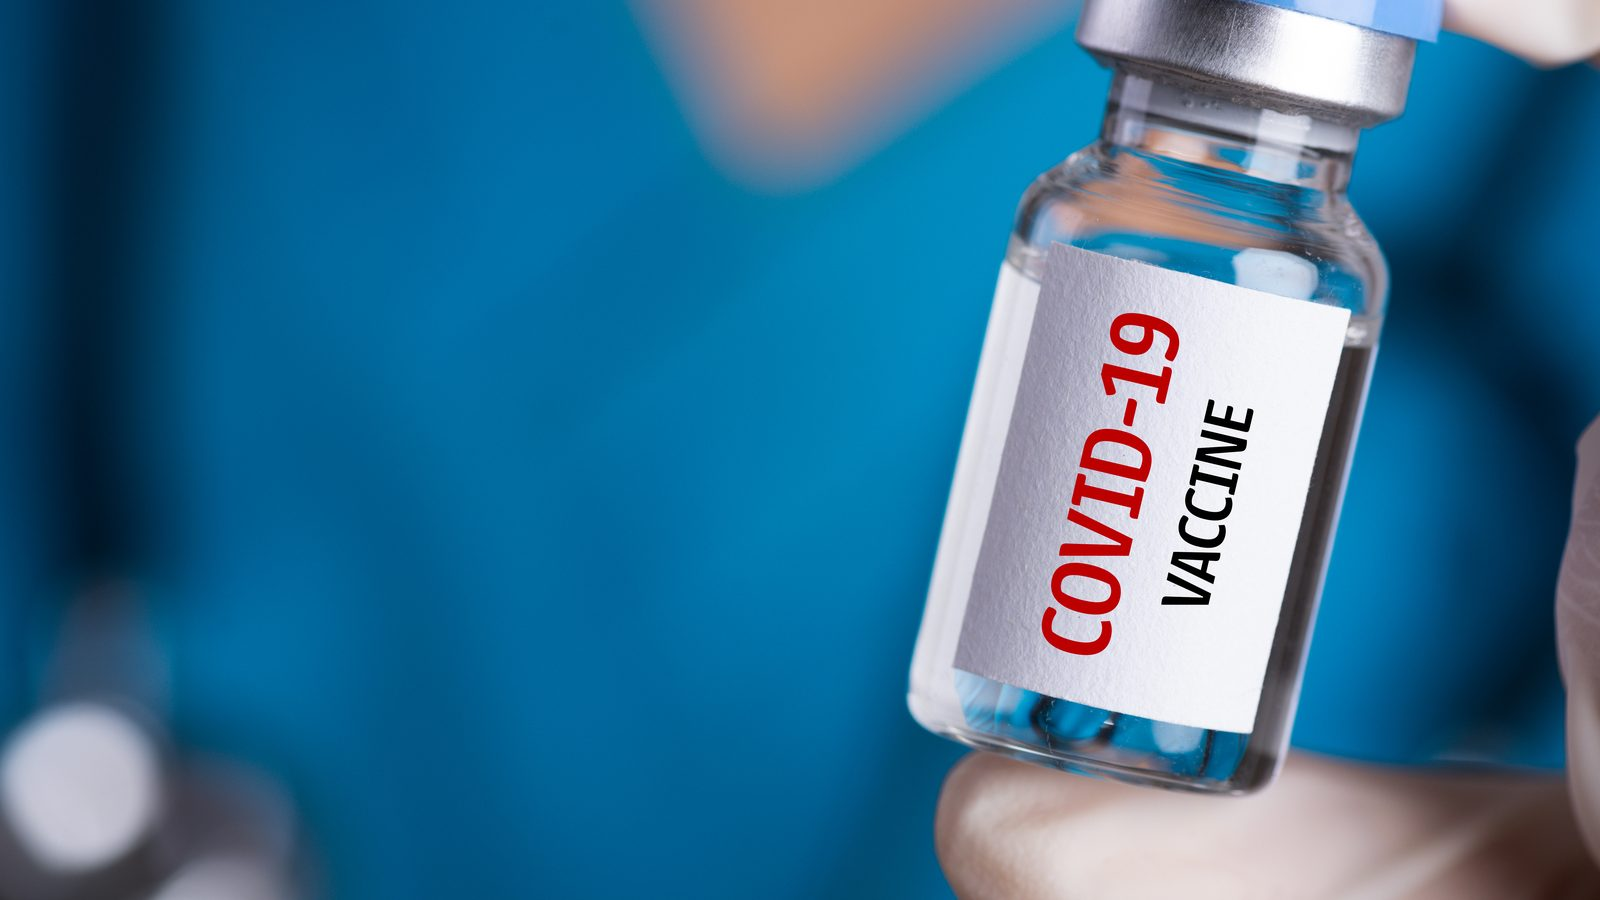 usgovtliftsexportbanonessentialrawmaterialsrequiredformanufacturingcovidvaccineinindia